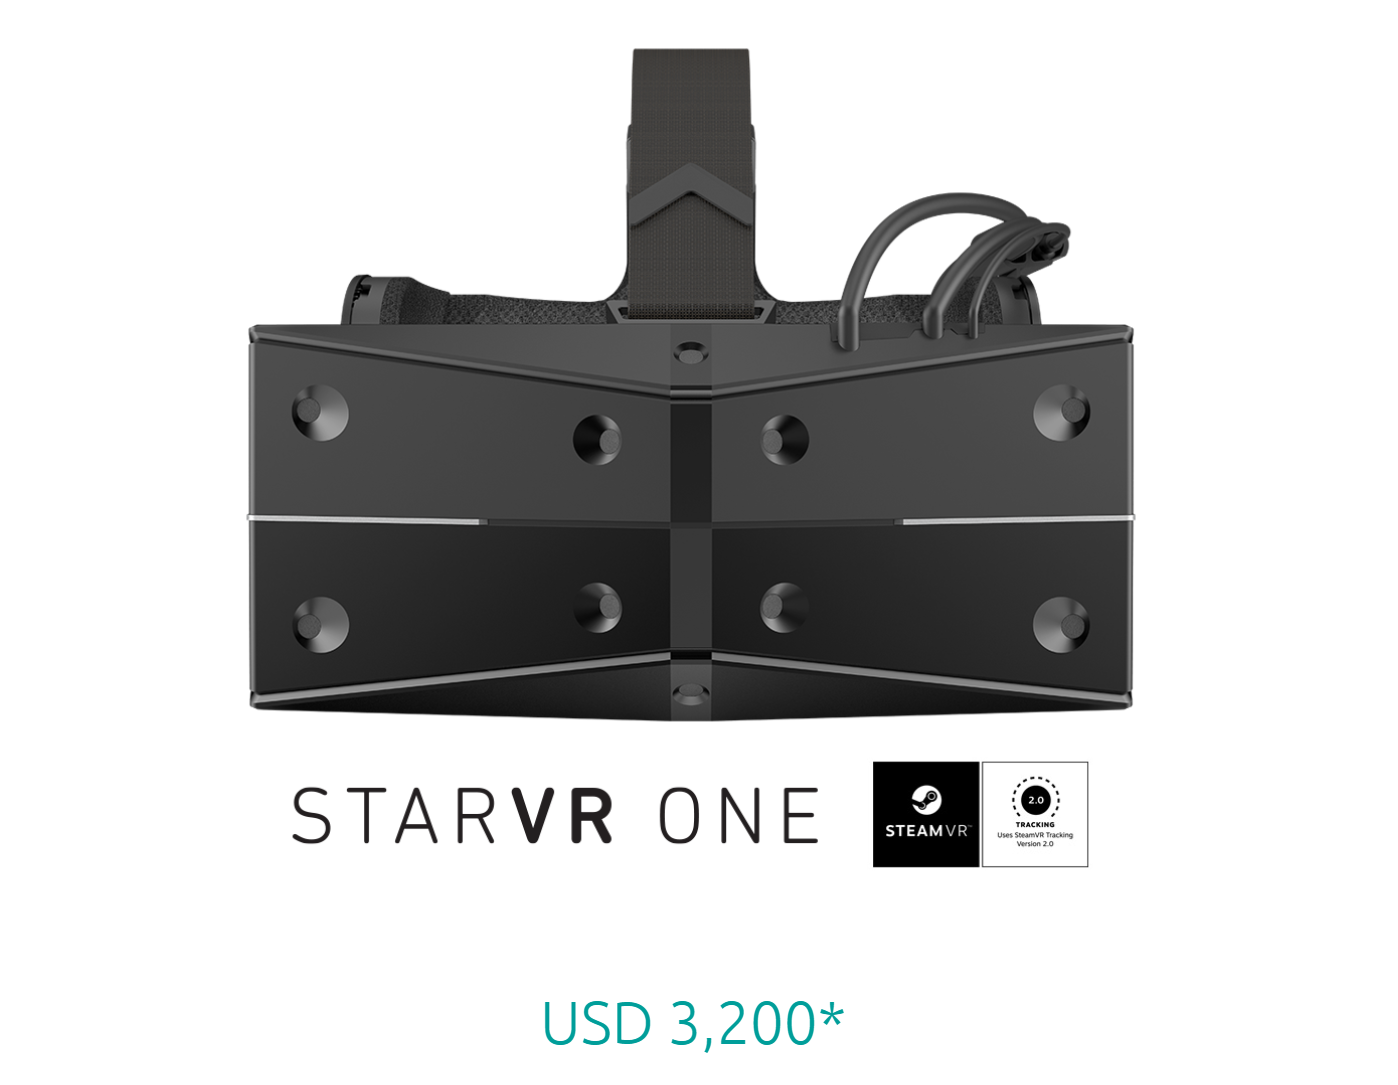 StarVR One Development Kit